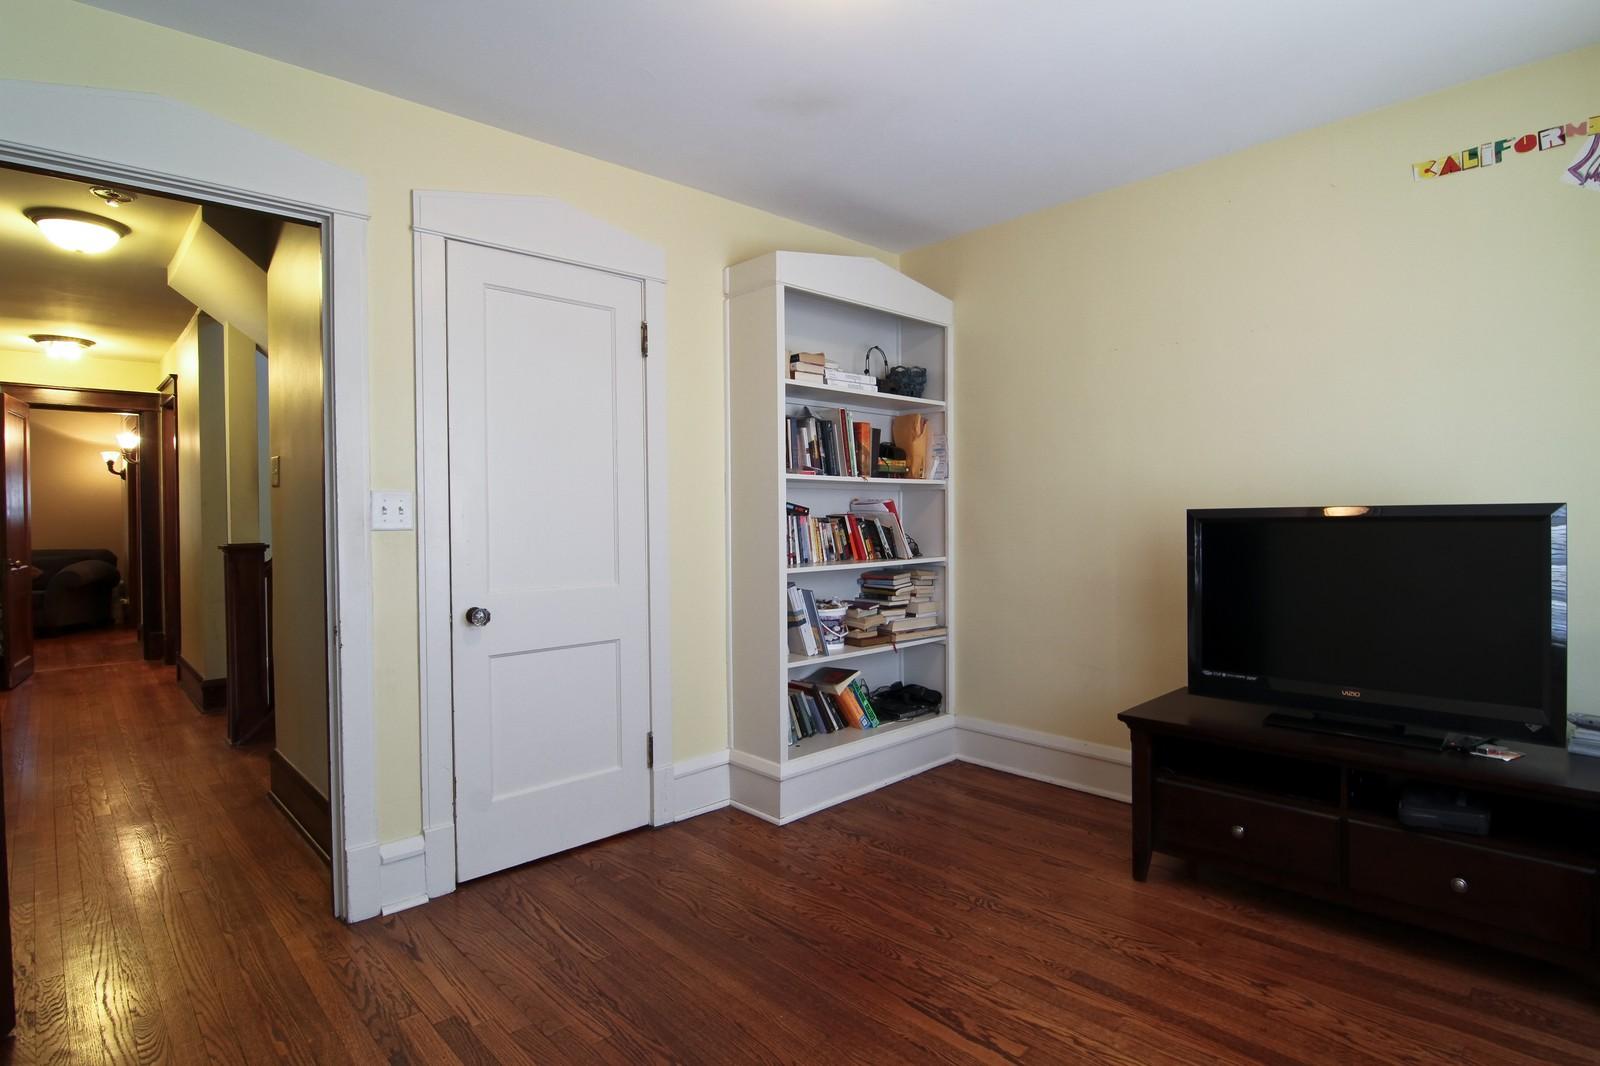 Real Estate Photography - 338 S. 8th, La Grange, IL, 60525 - 2nd Bedroom